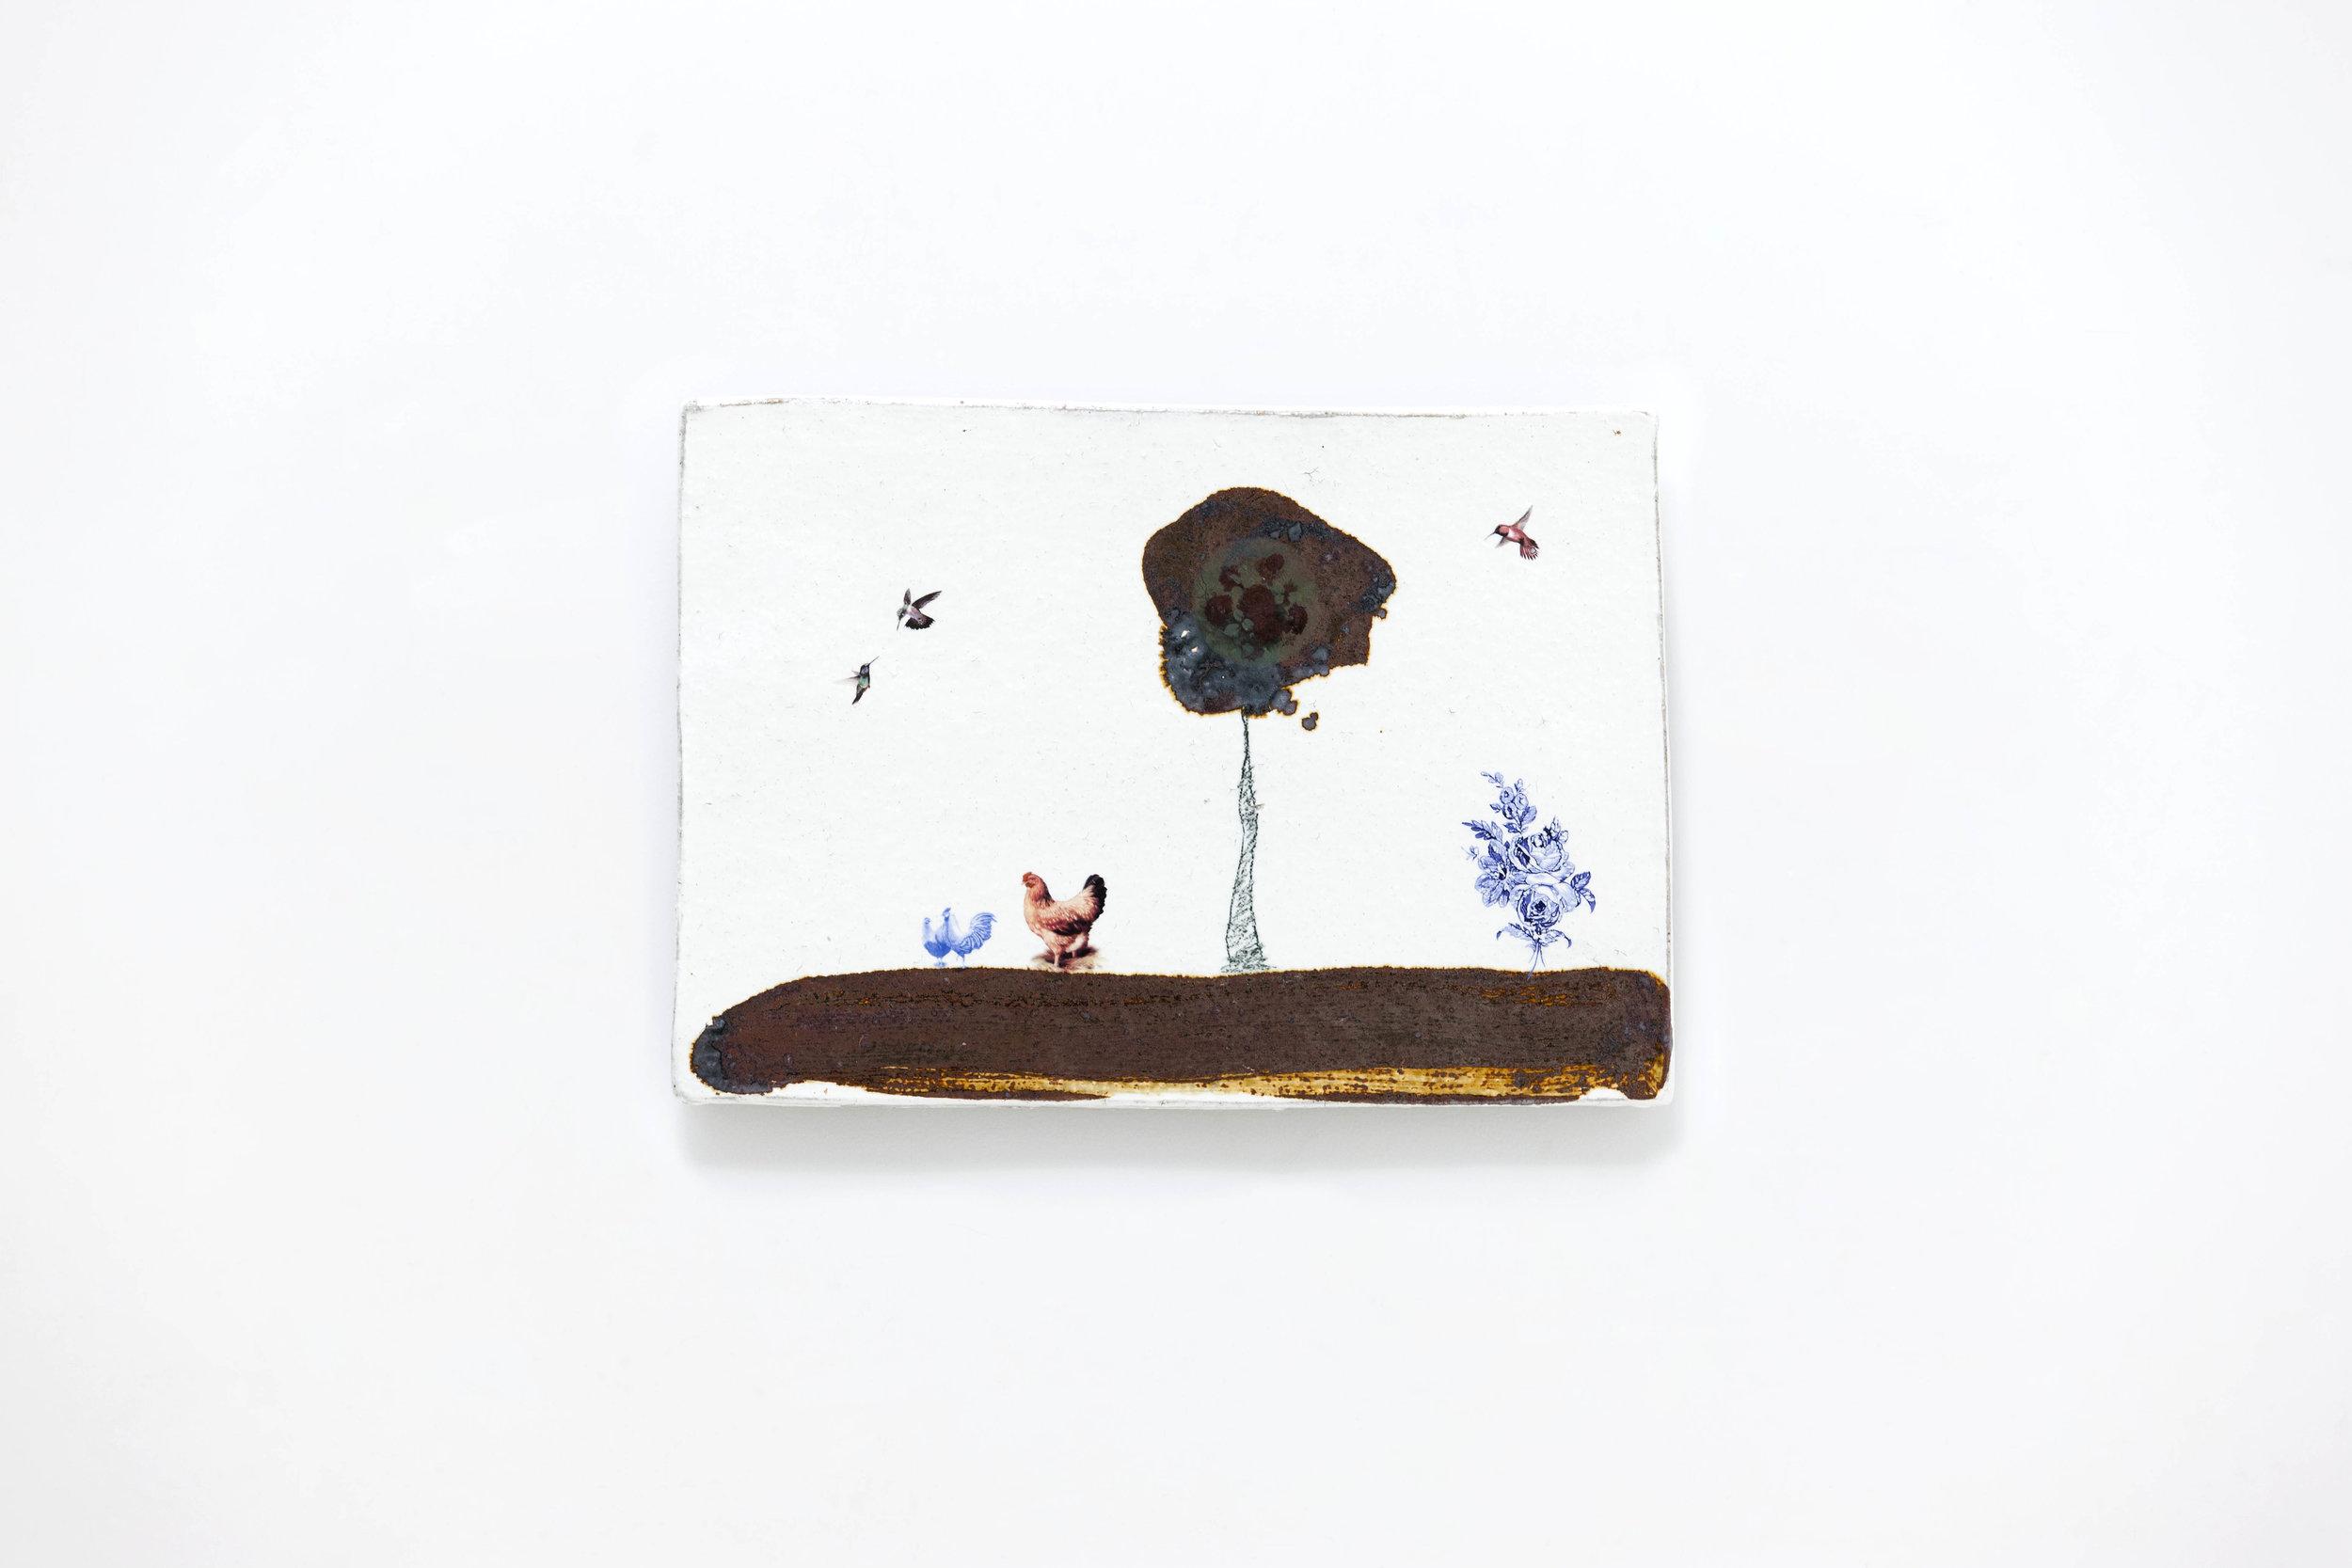 LEE Hun Chung,Bada 151110-20,Glazed Ceramic,38W x 1D x 27H cm,14.96W x 0.39D x 10.63H inch ,2015.jpg